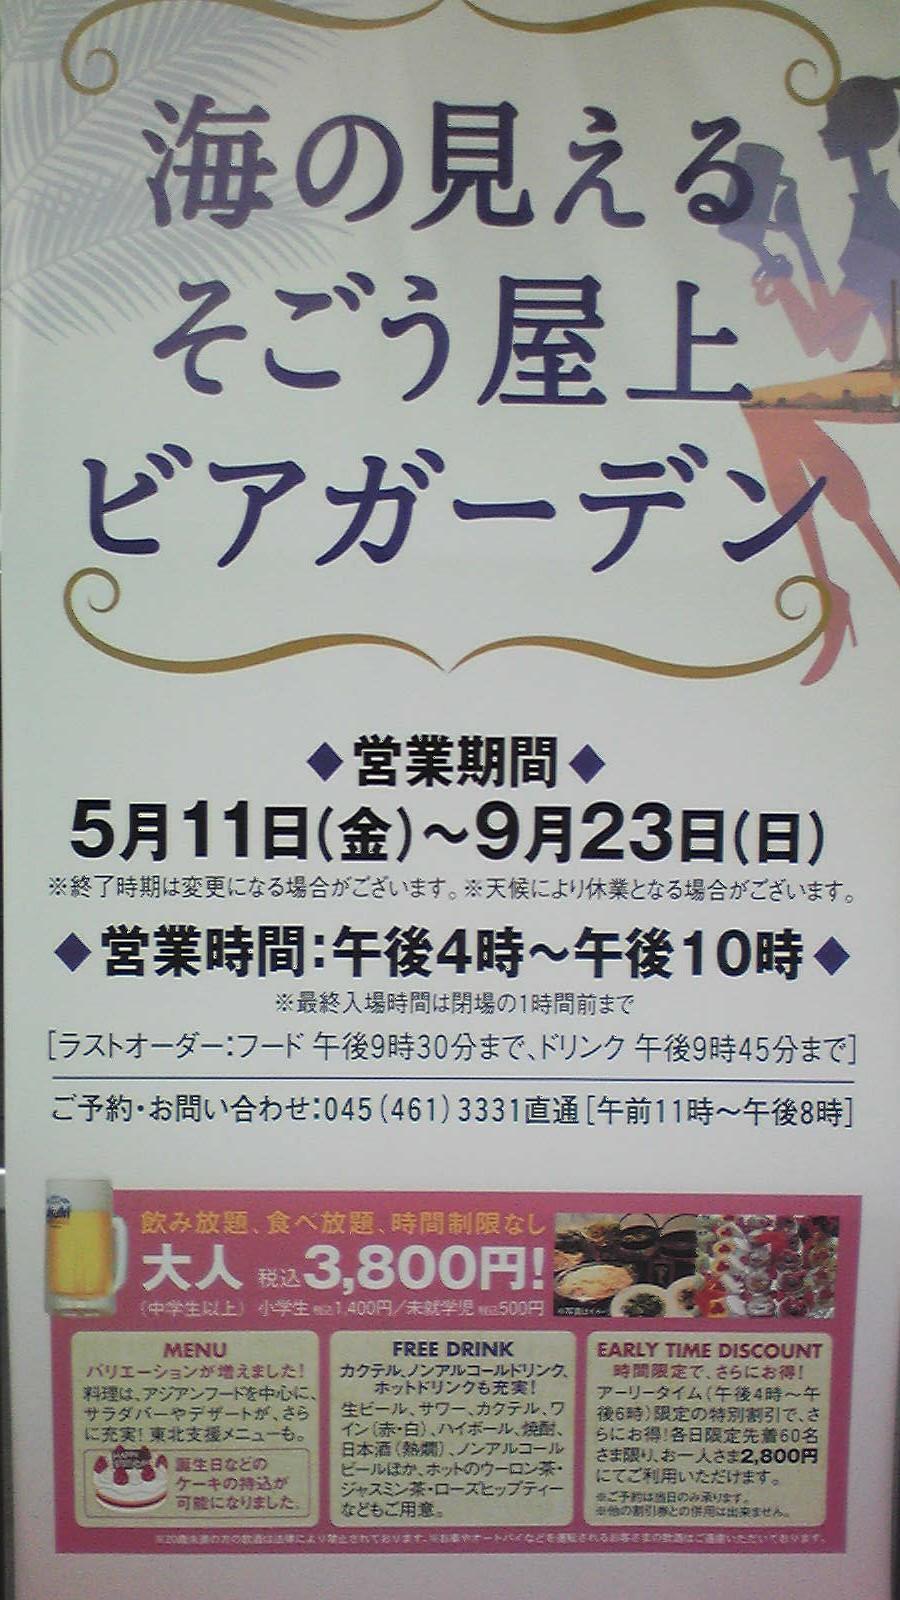 http://www.washin-optical.co.jp/blog/ladies/120604_173623.jpg